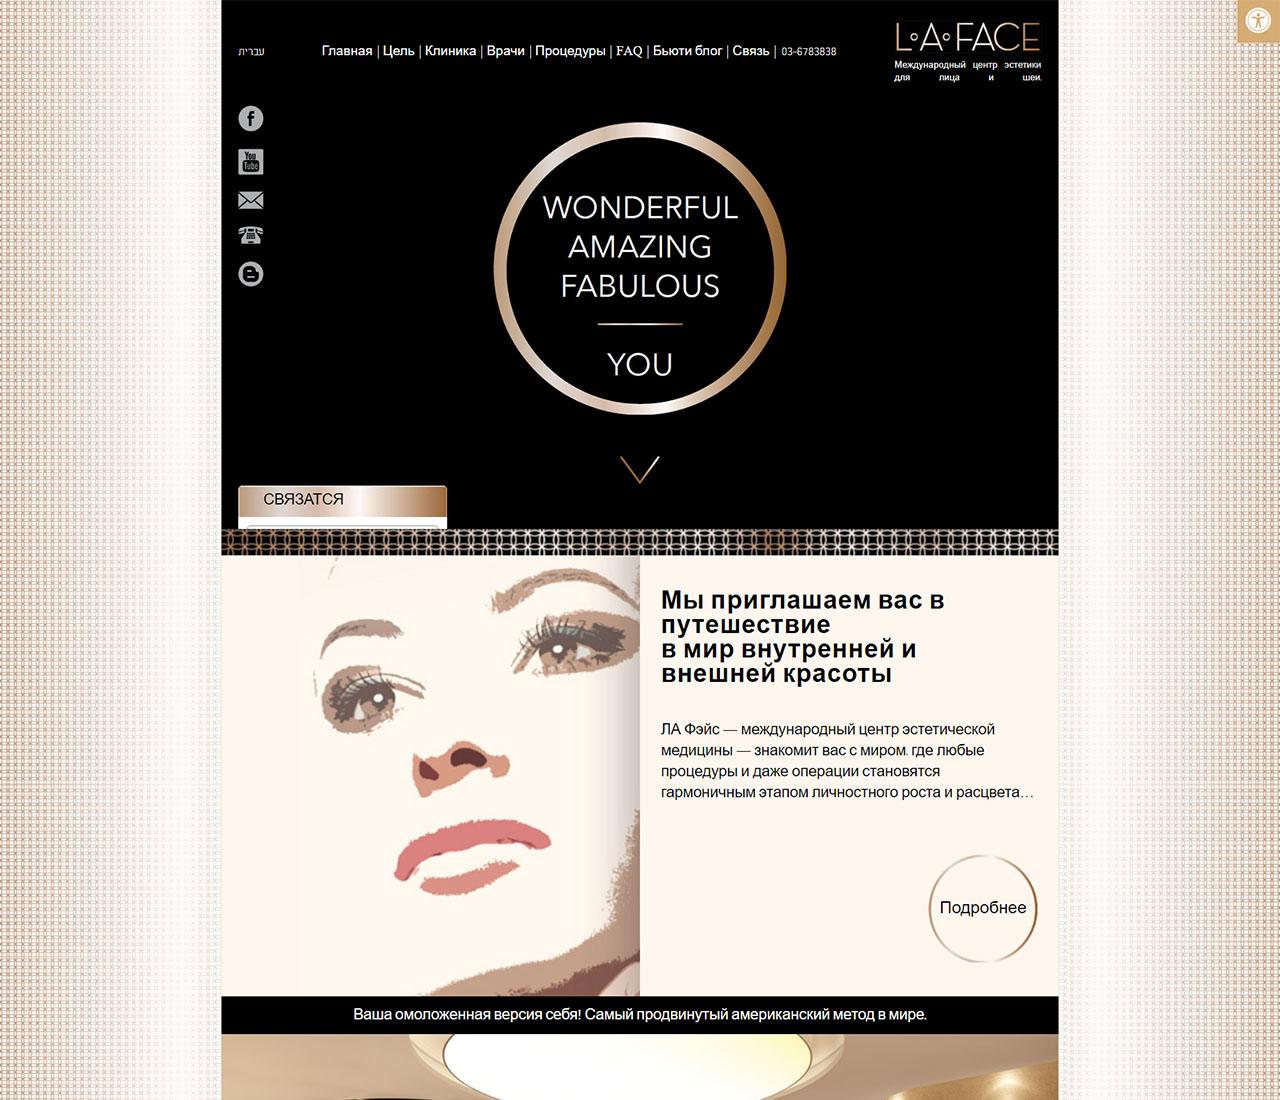 La-face.co.il — Сайт под ключ